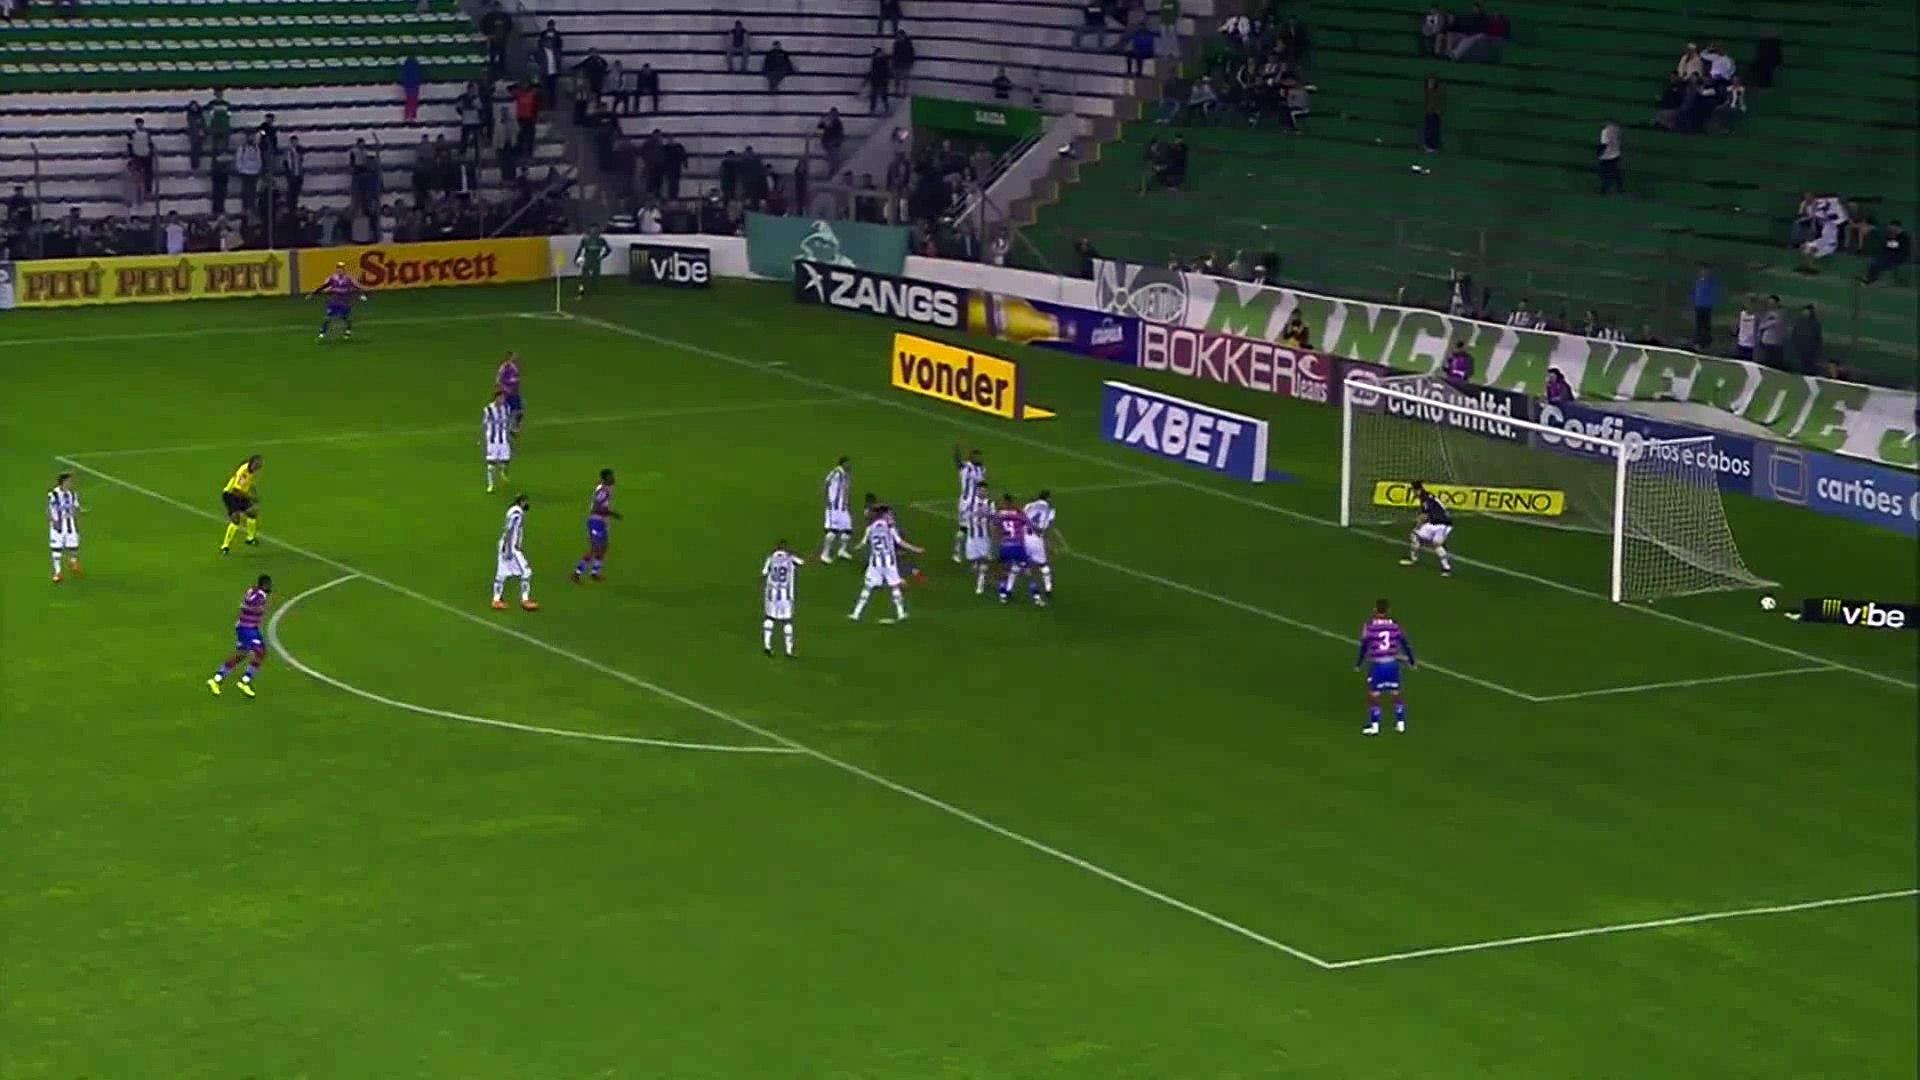 [GOL DE GETTERSON] Juventude 0 x 3 Fortaleza - Série B 2018